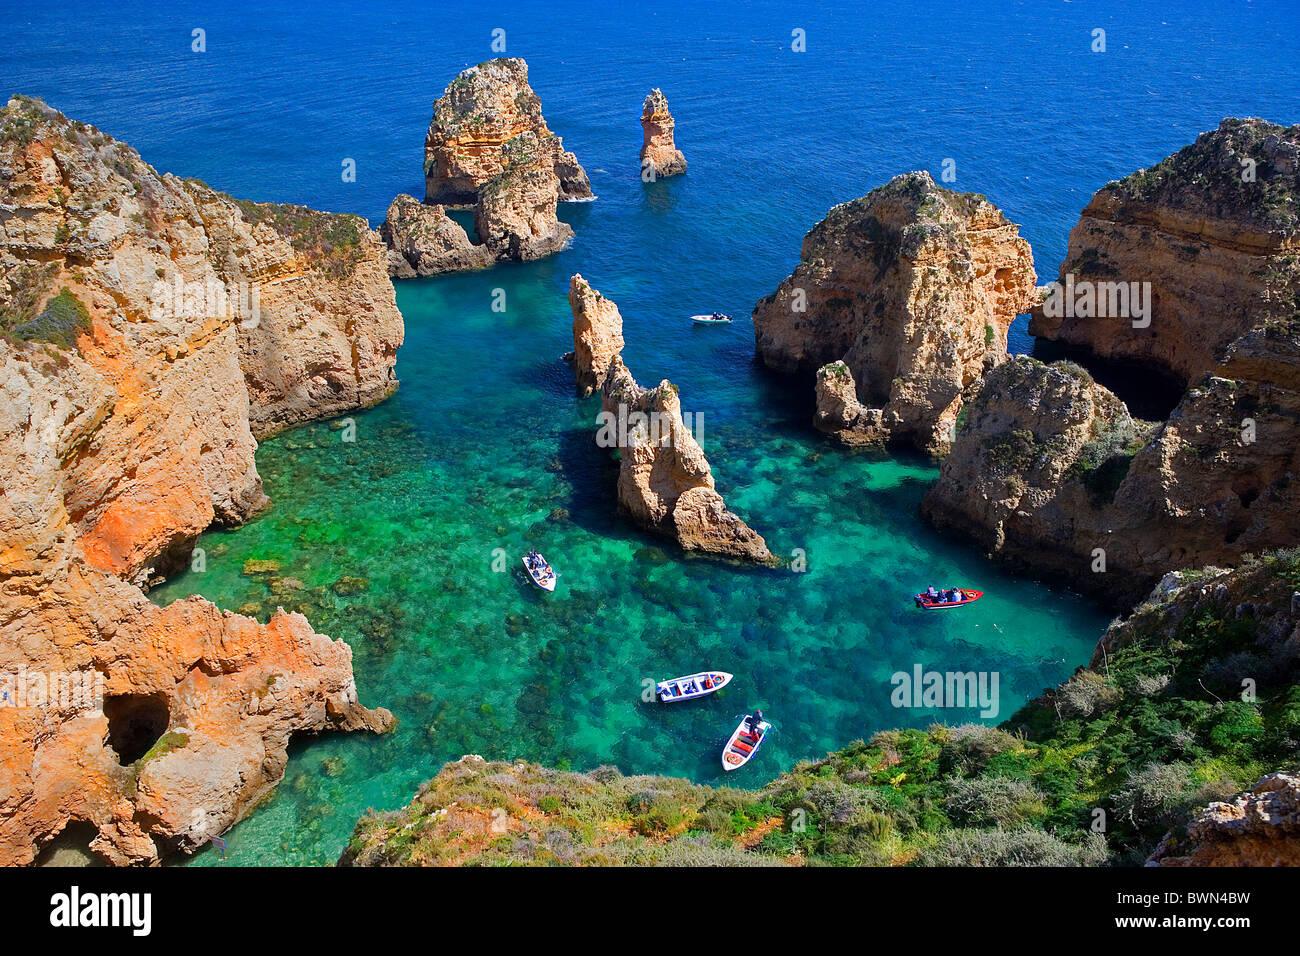 Hotels In Algarve Portugal Near The Beach